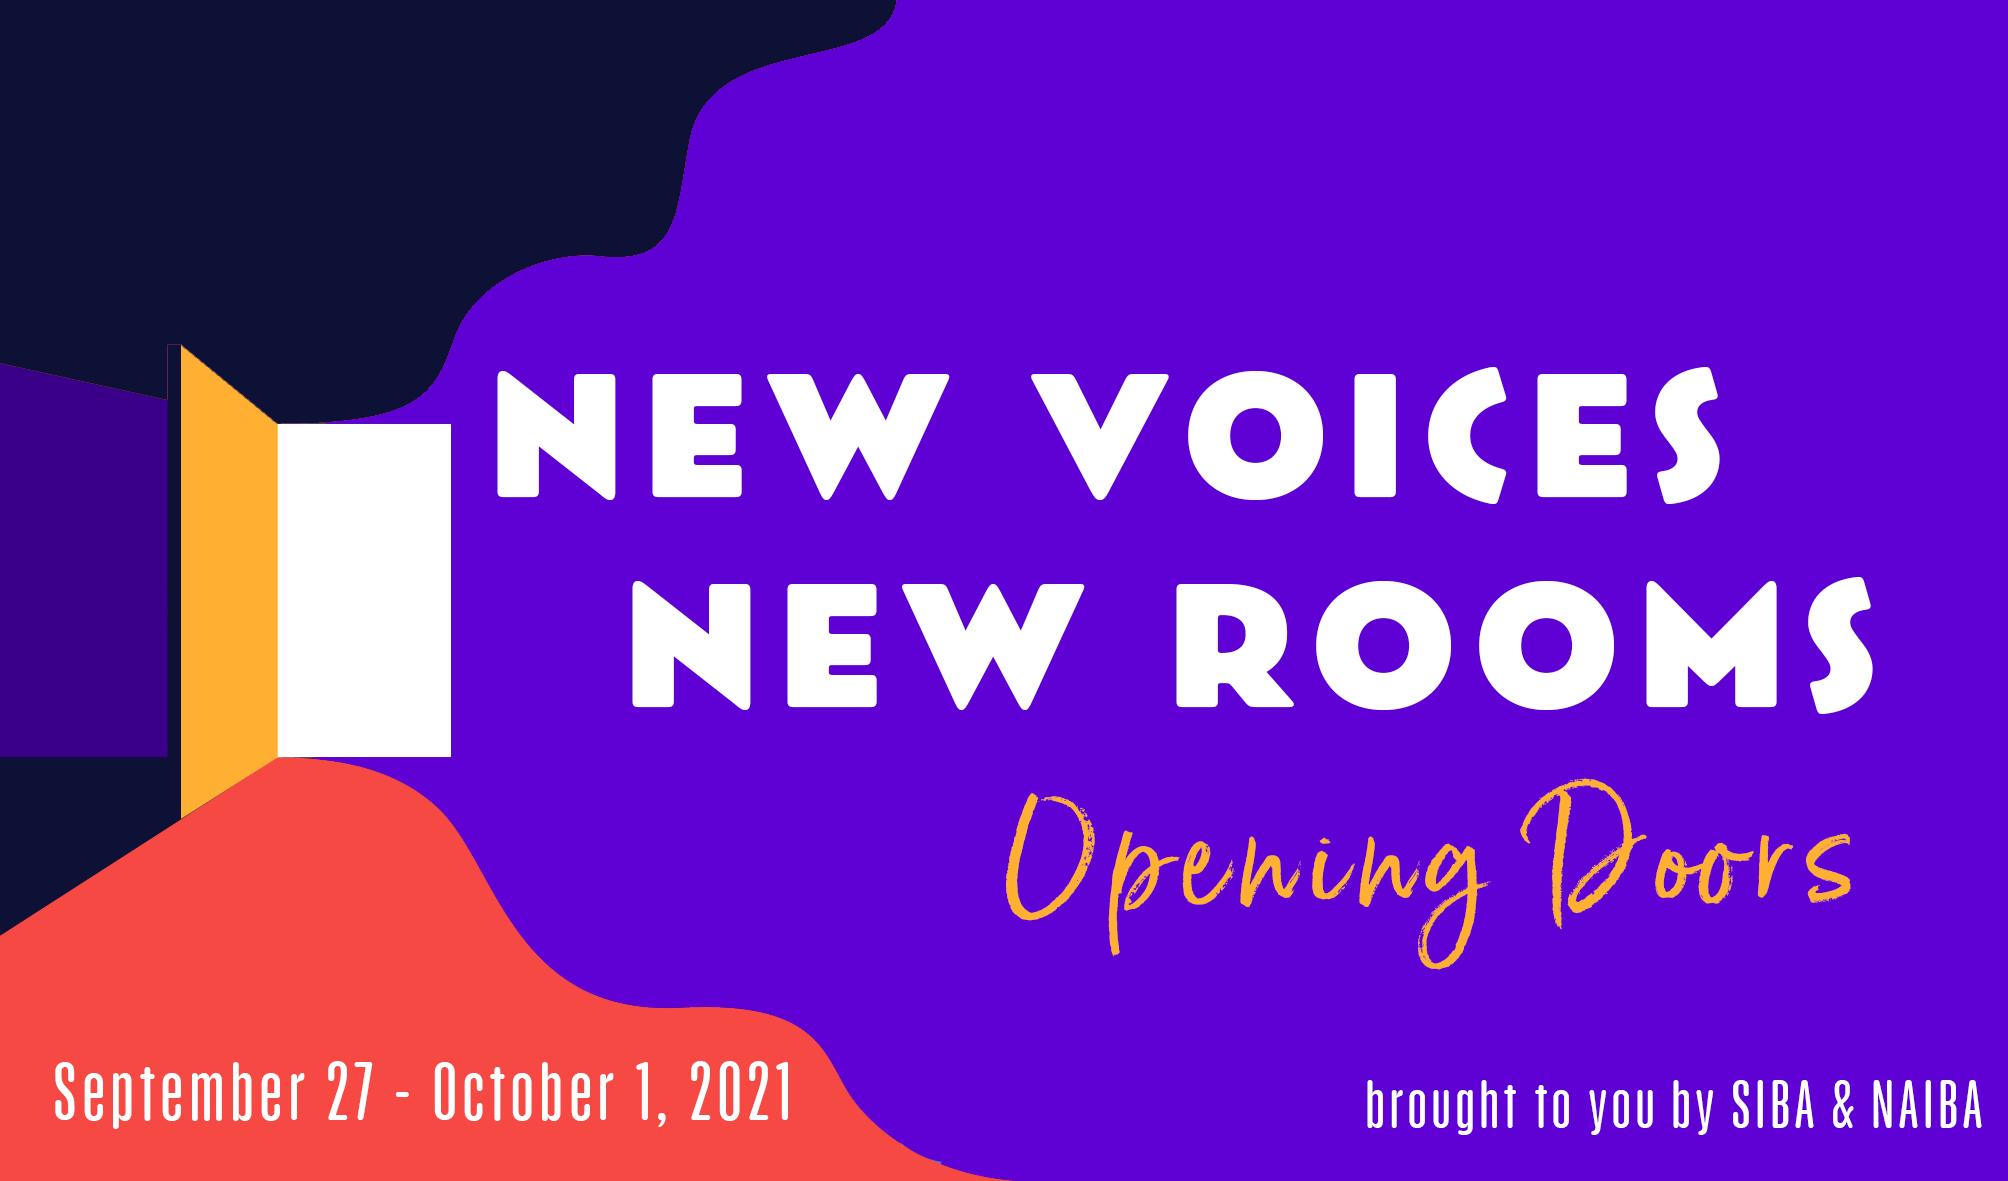 NVNR 2021 9/27-10/1: Opening Doors